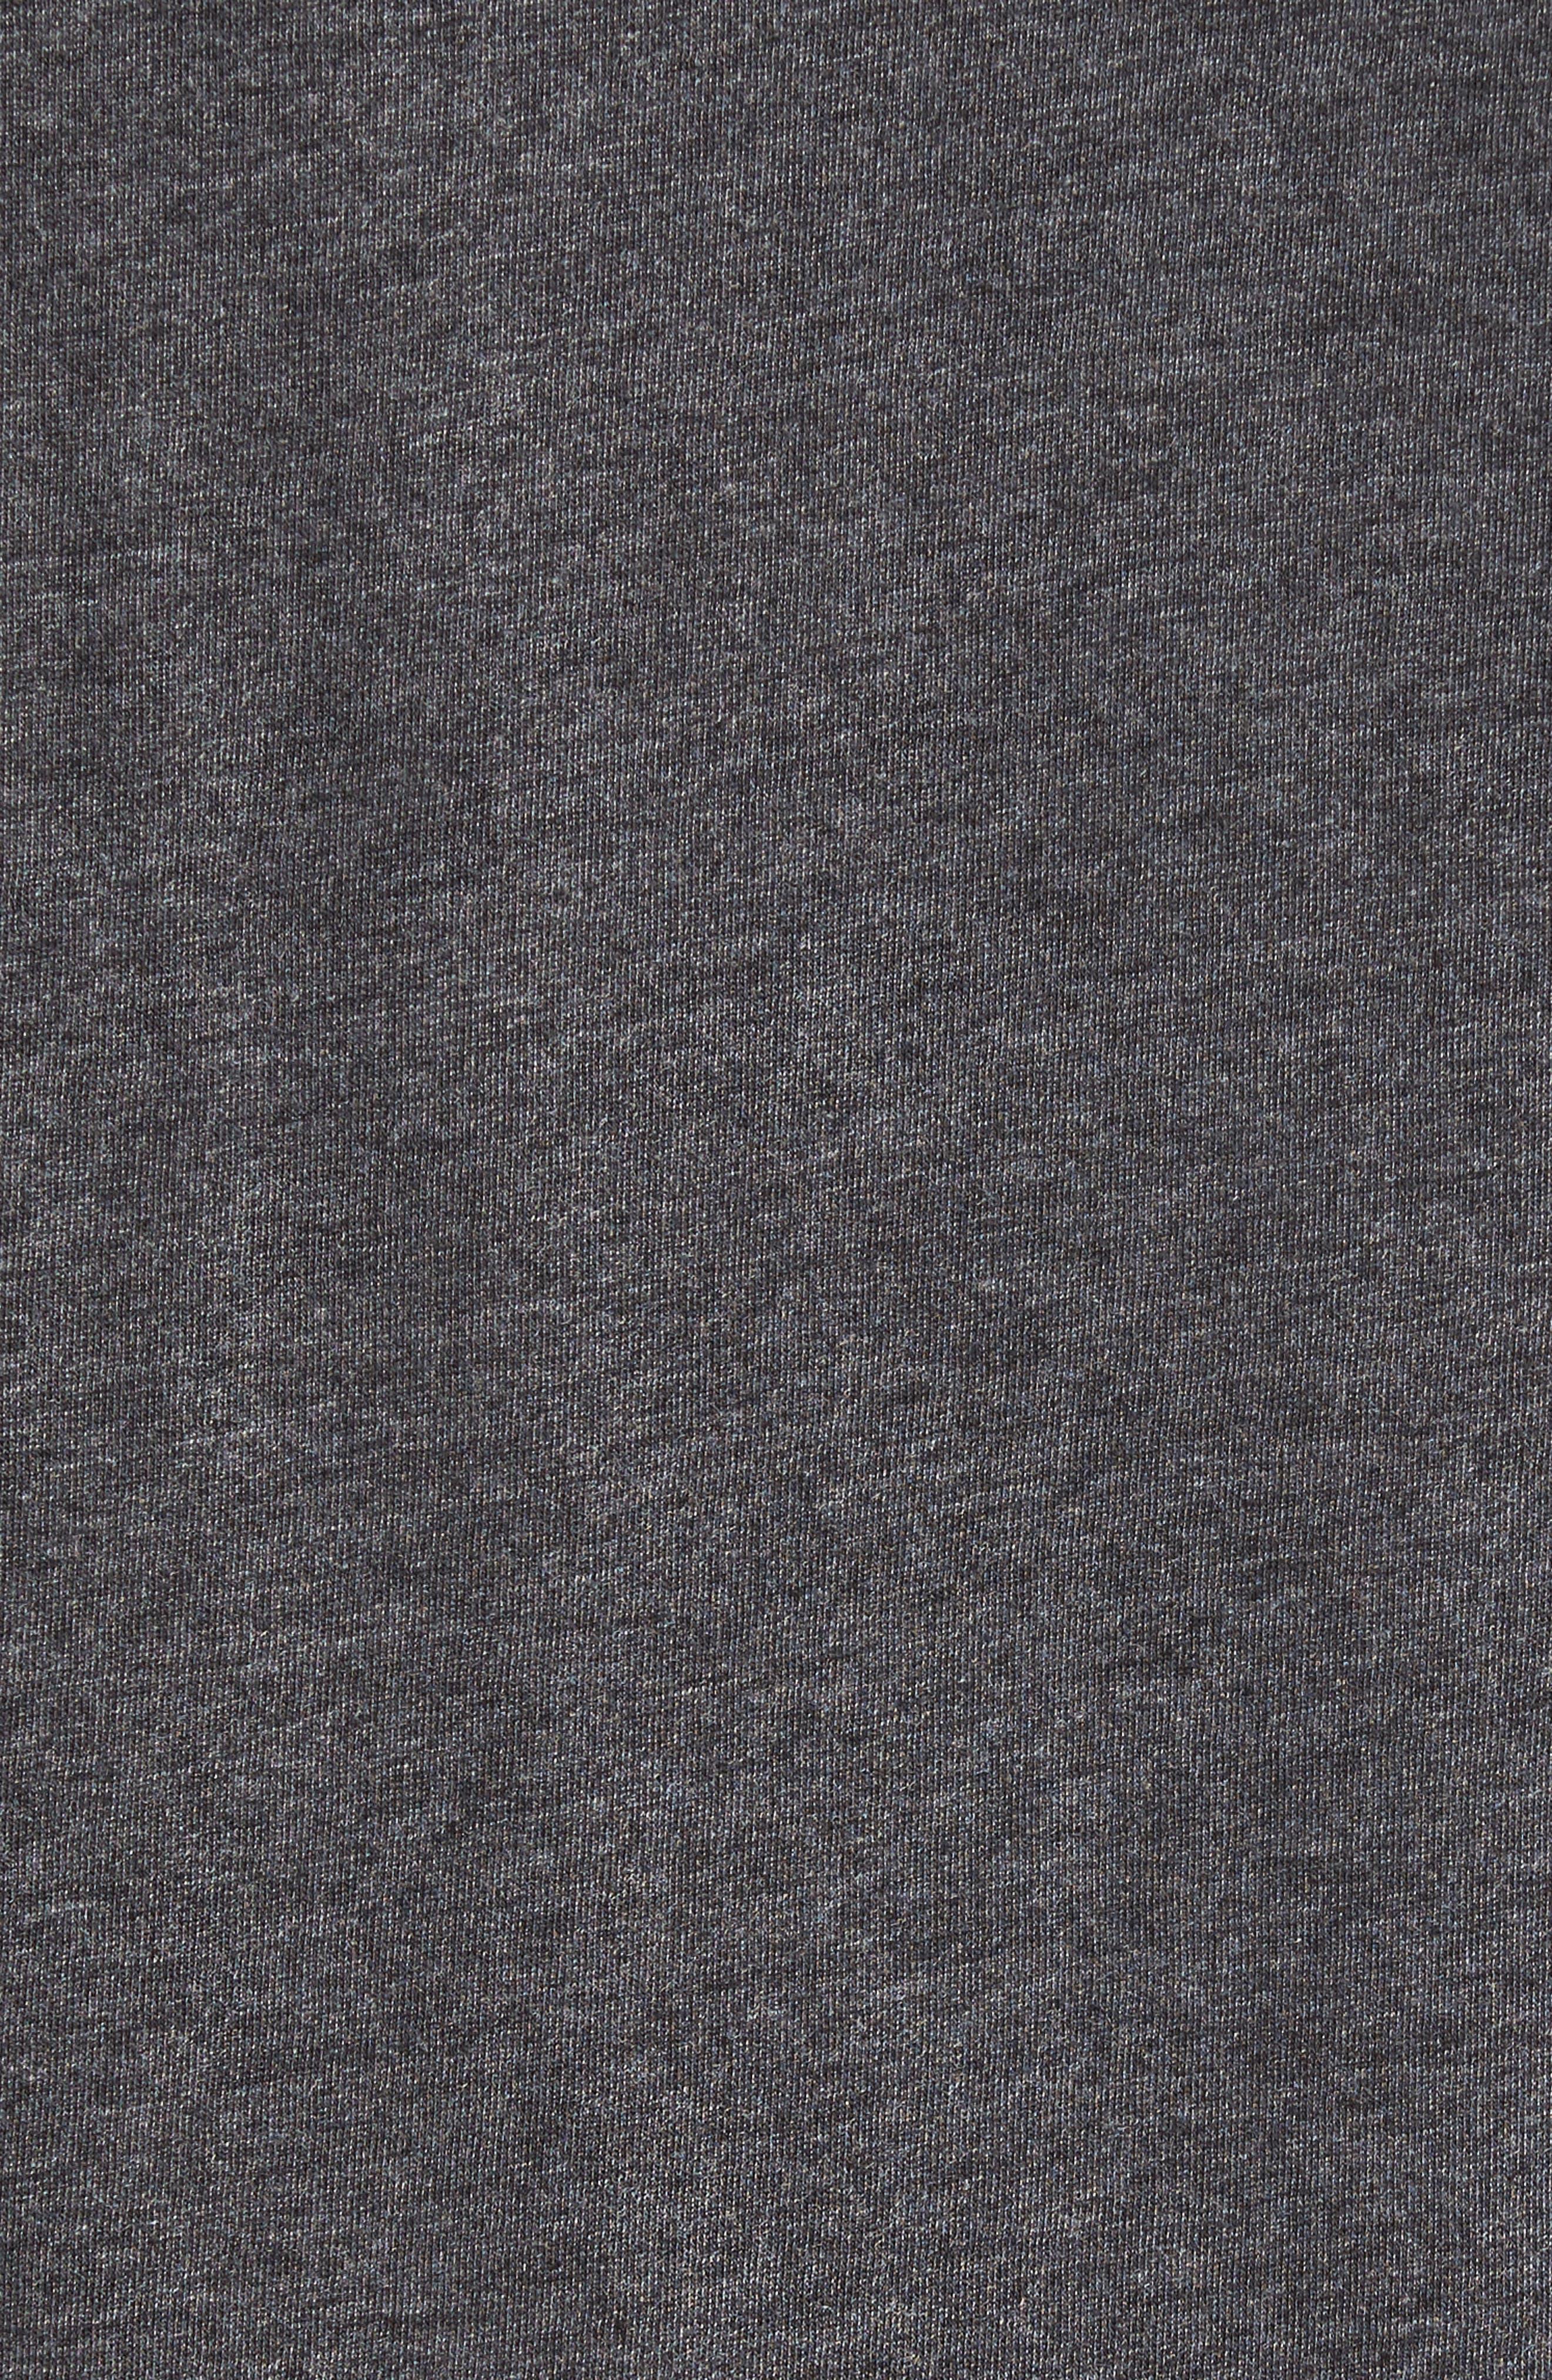 Alternate Image 6  - Tailor Vintage Reversible T-Shirt